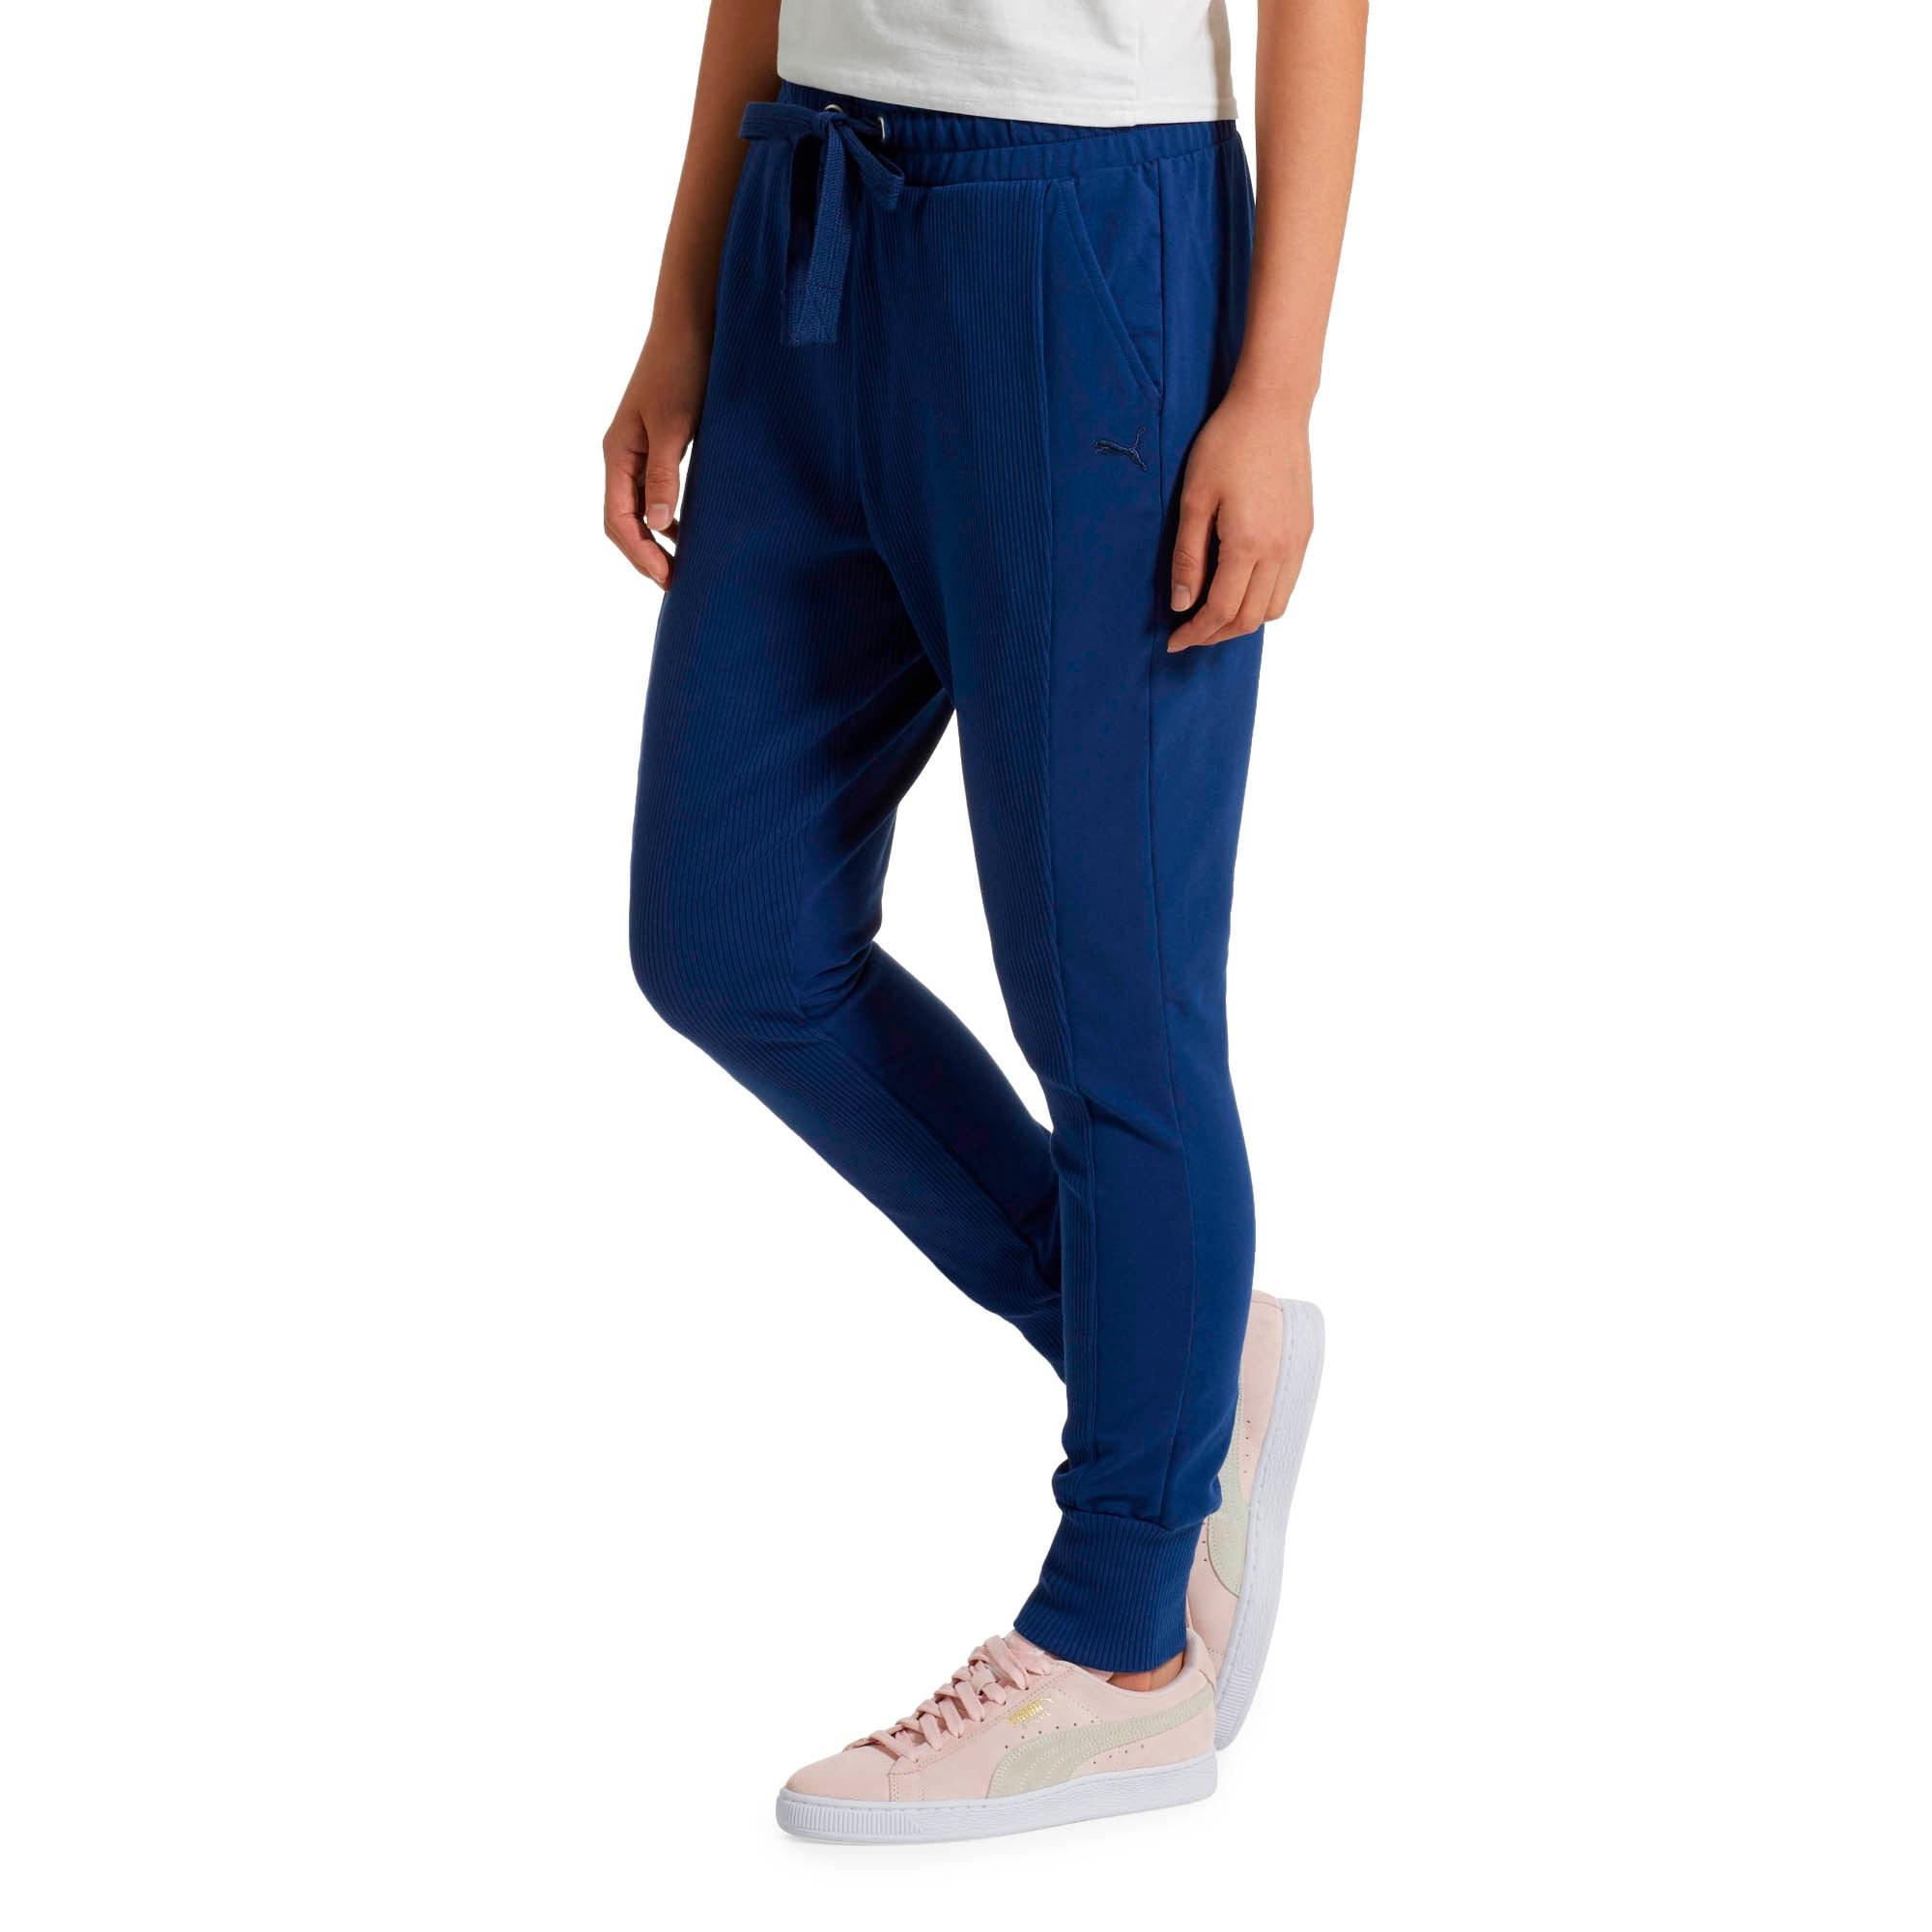 Thumbnail 2 of Fusion Sweatpants, Blue Depths, medium